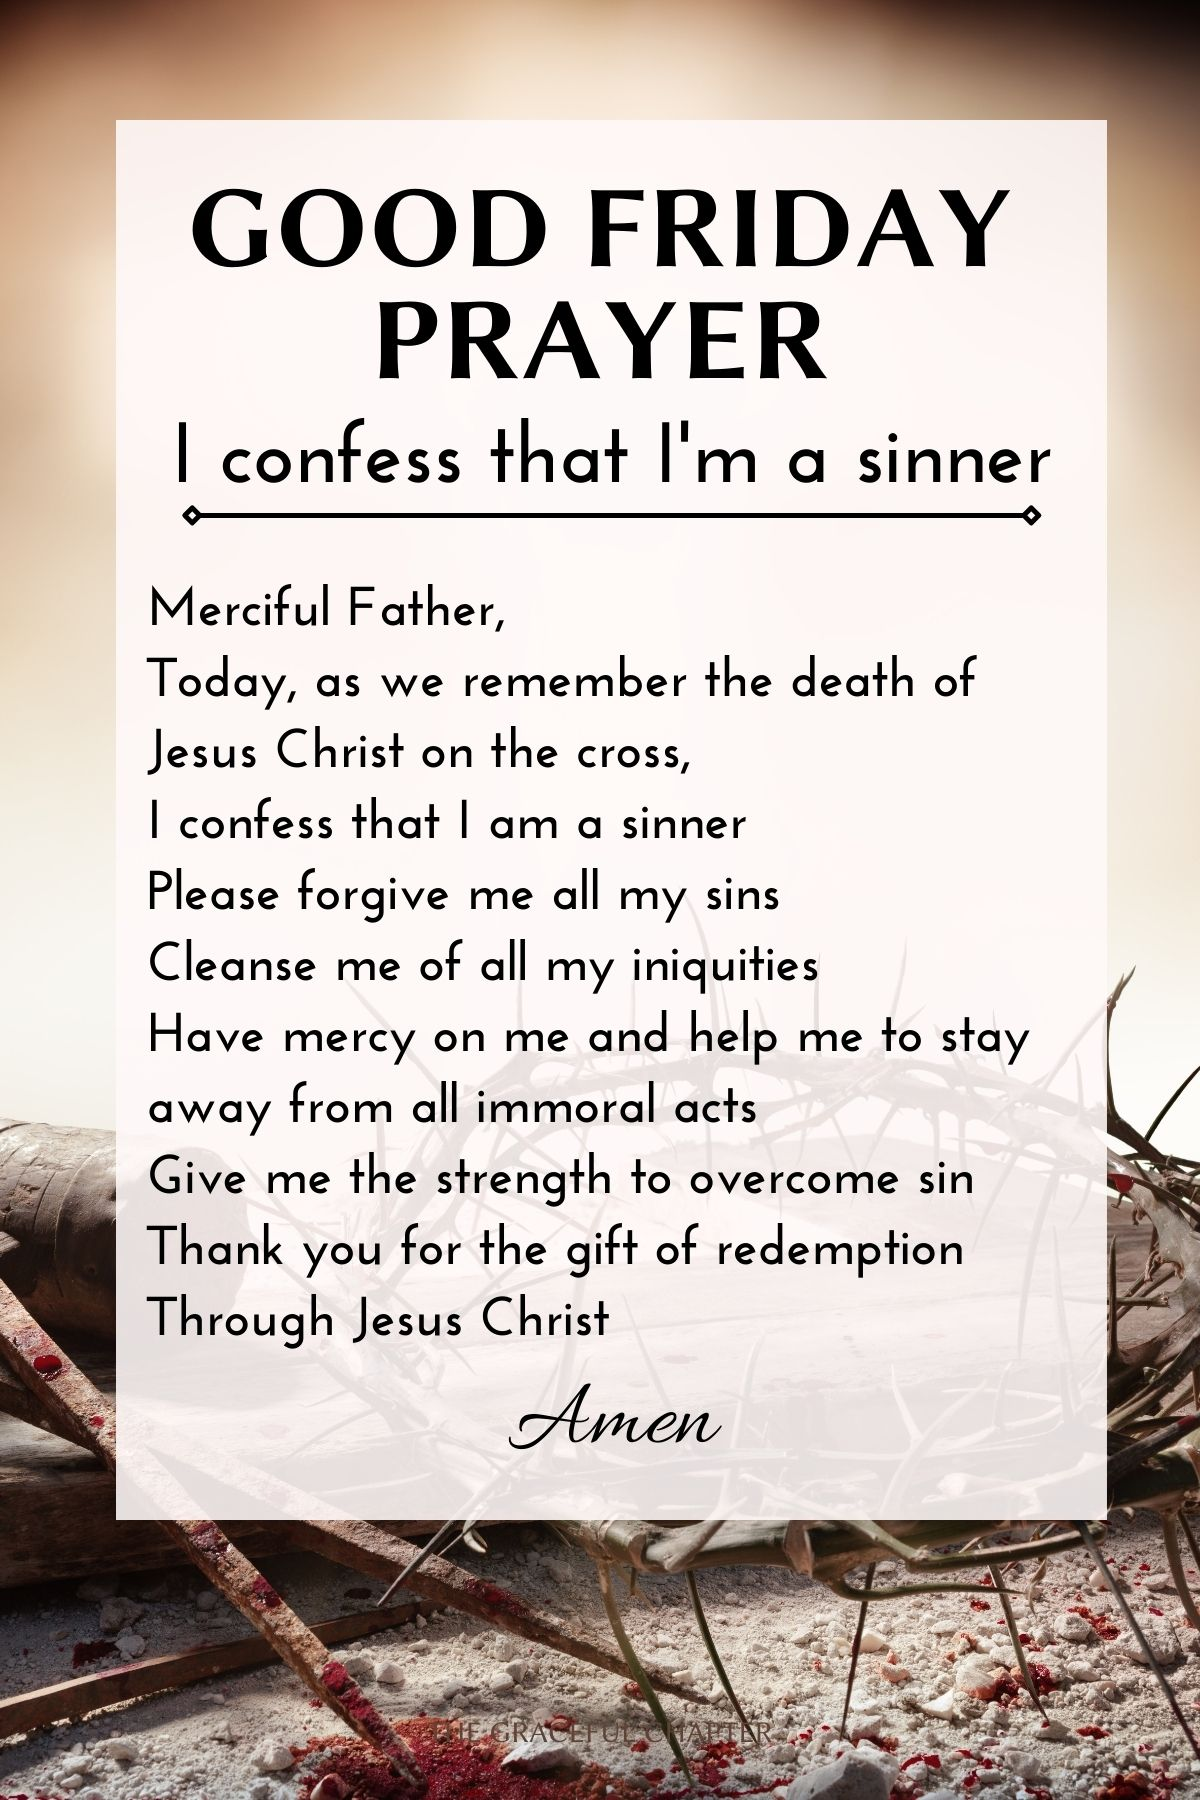 Good Friday Prayer - I confess that I'm a sinner